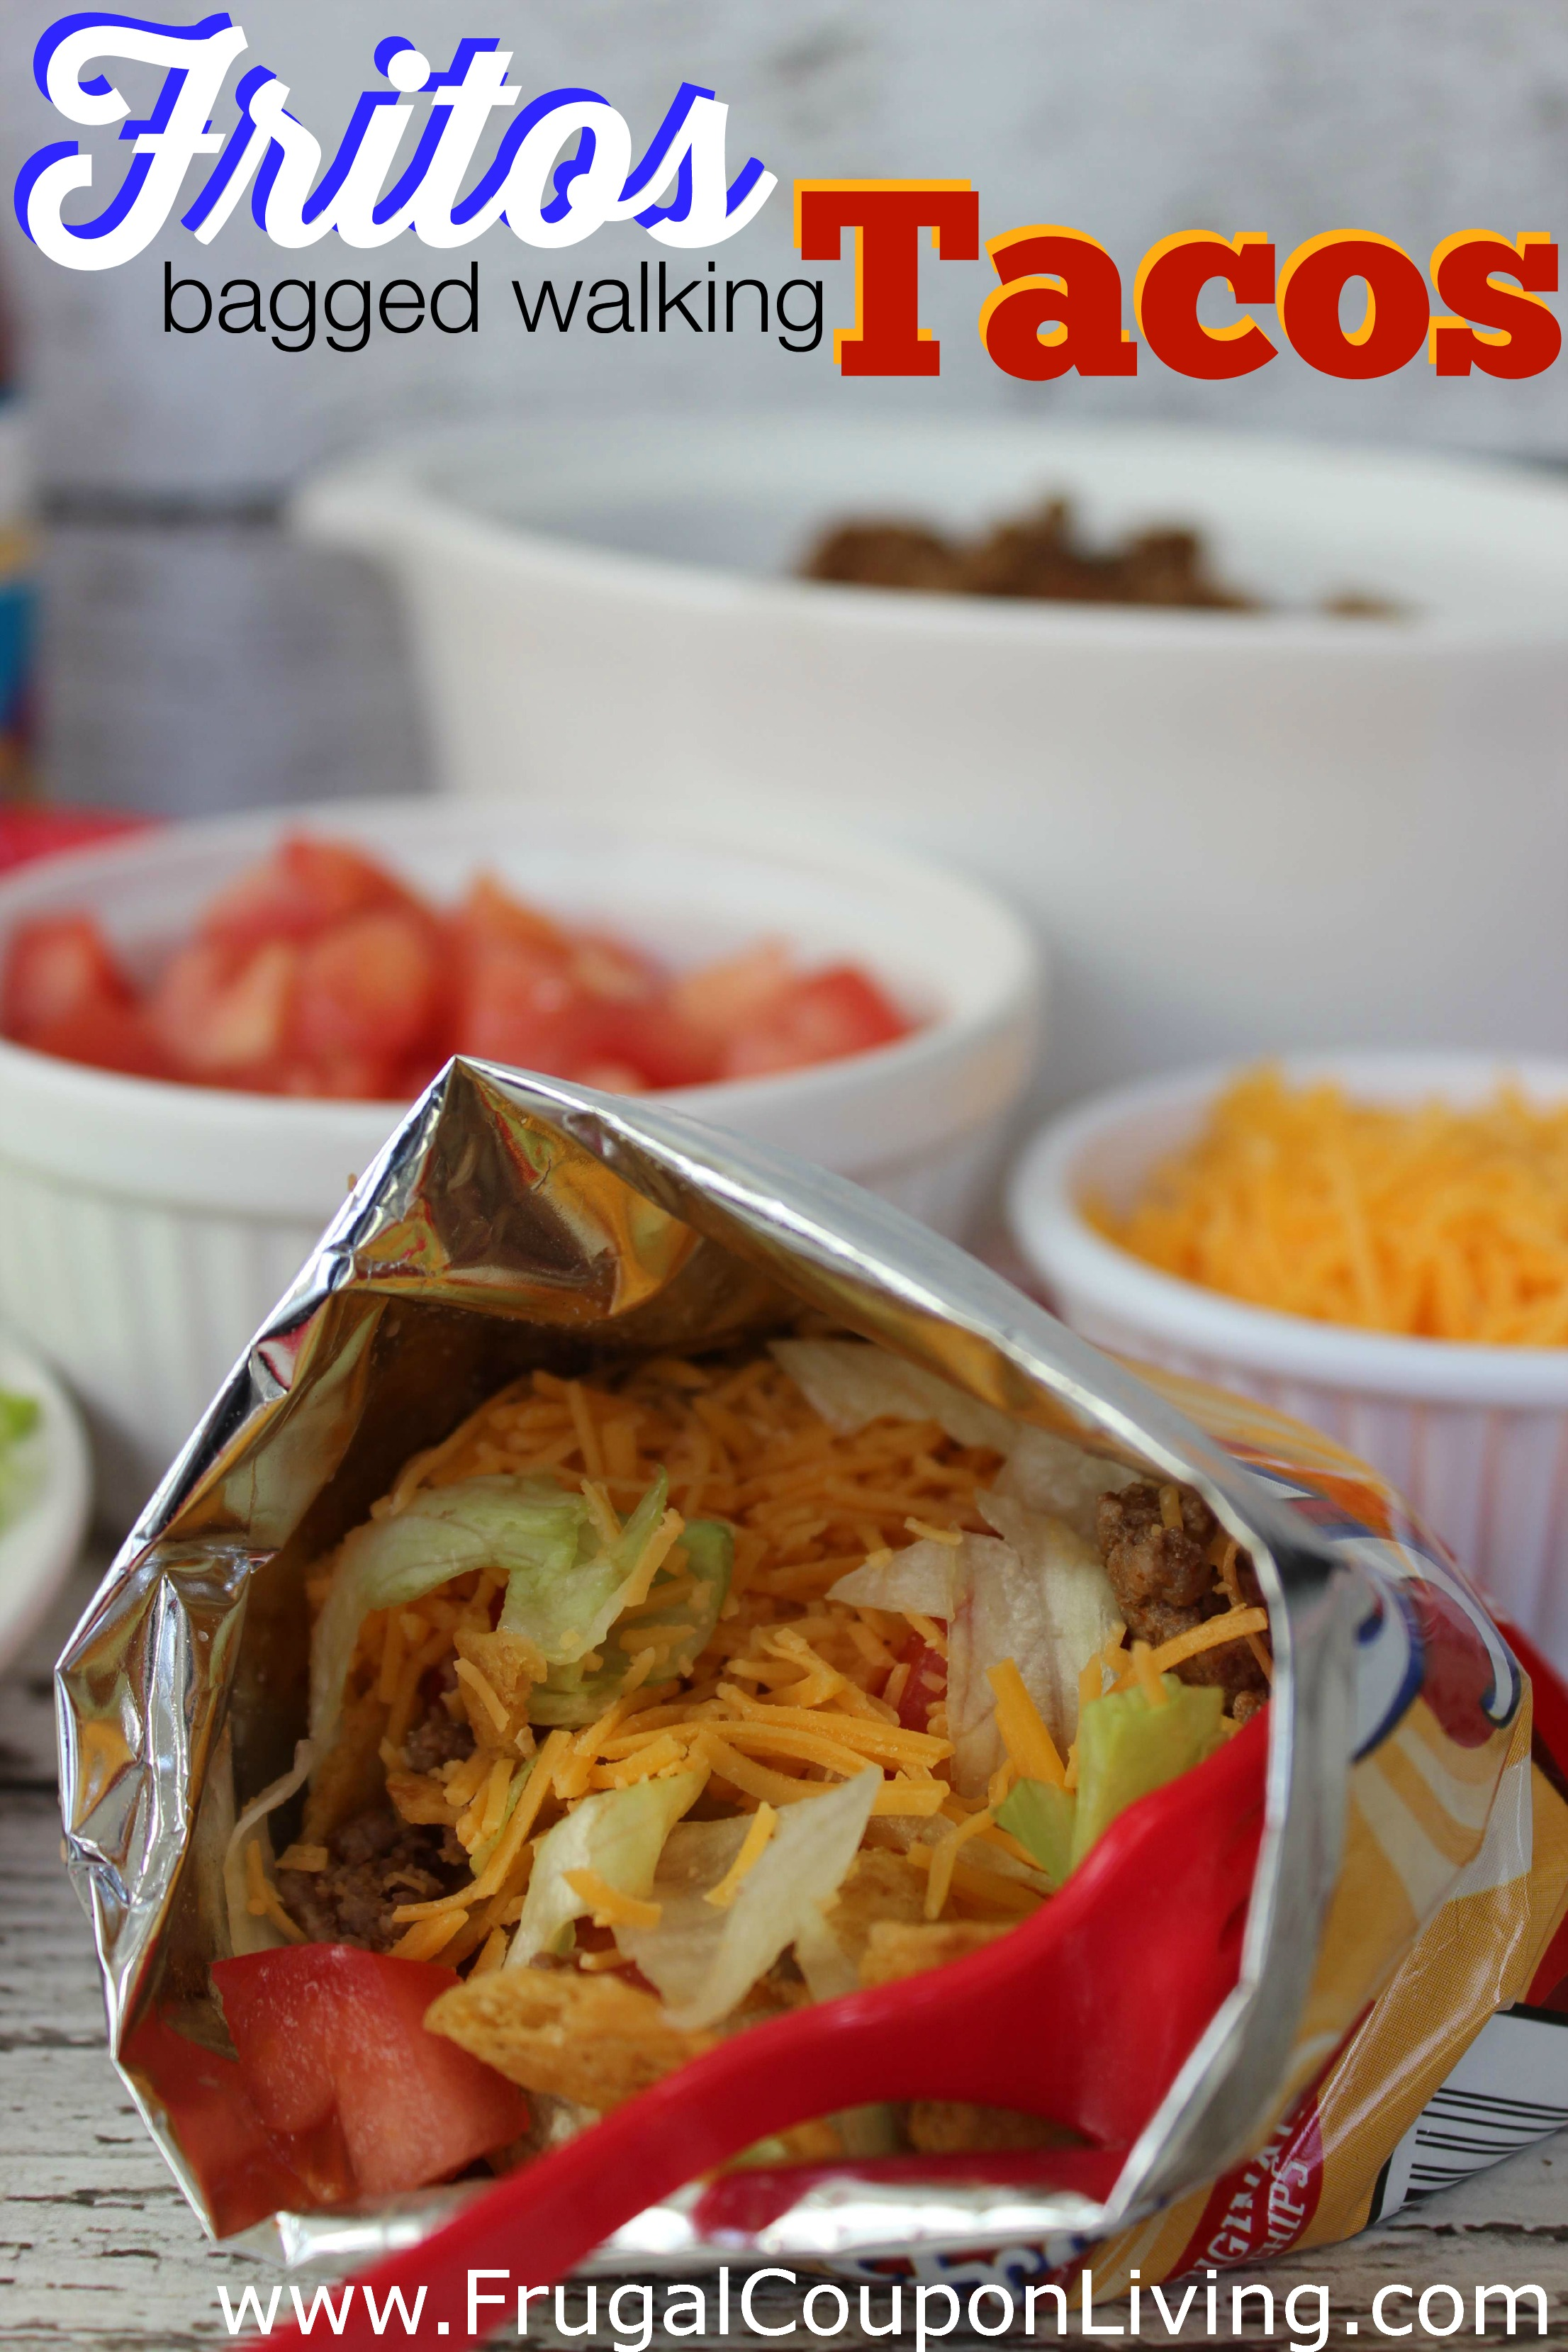 fritos-tacos-bagged-walking-frugal-coupon-living